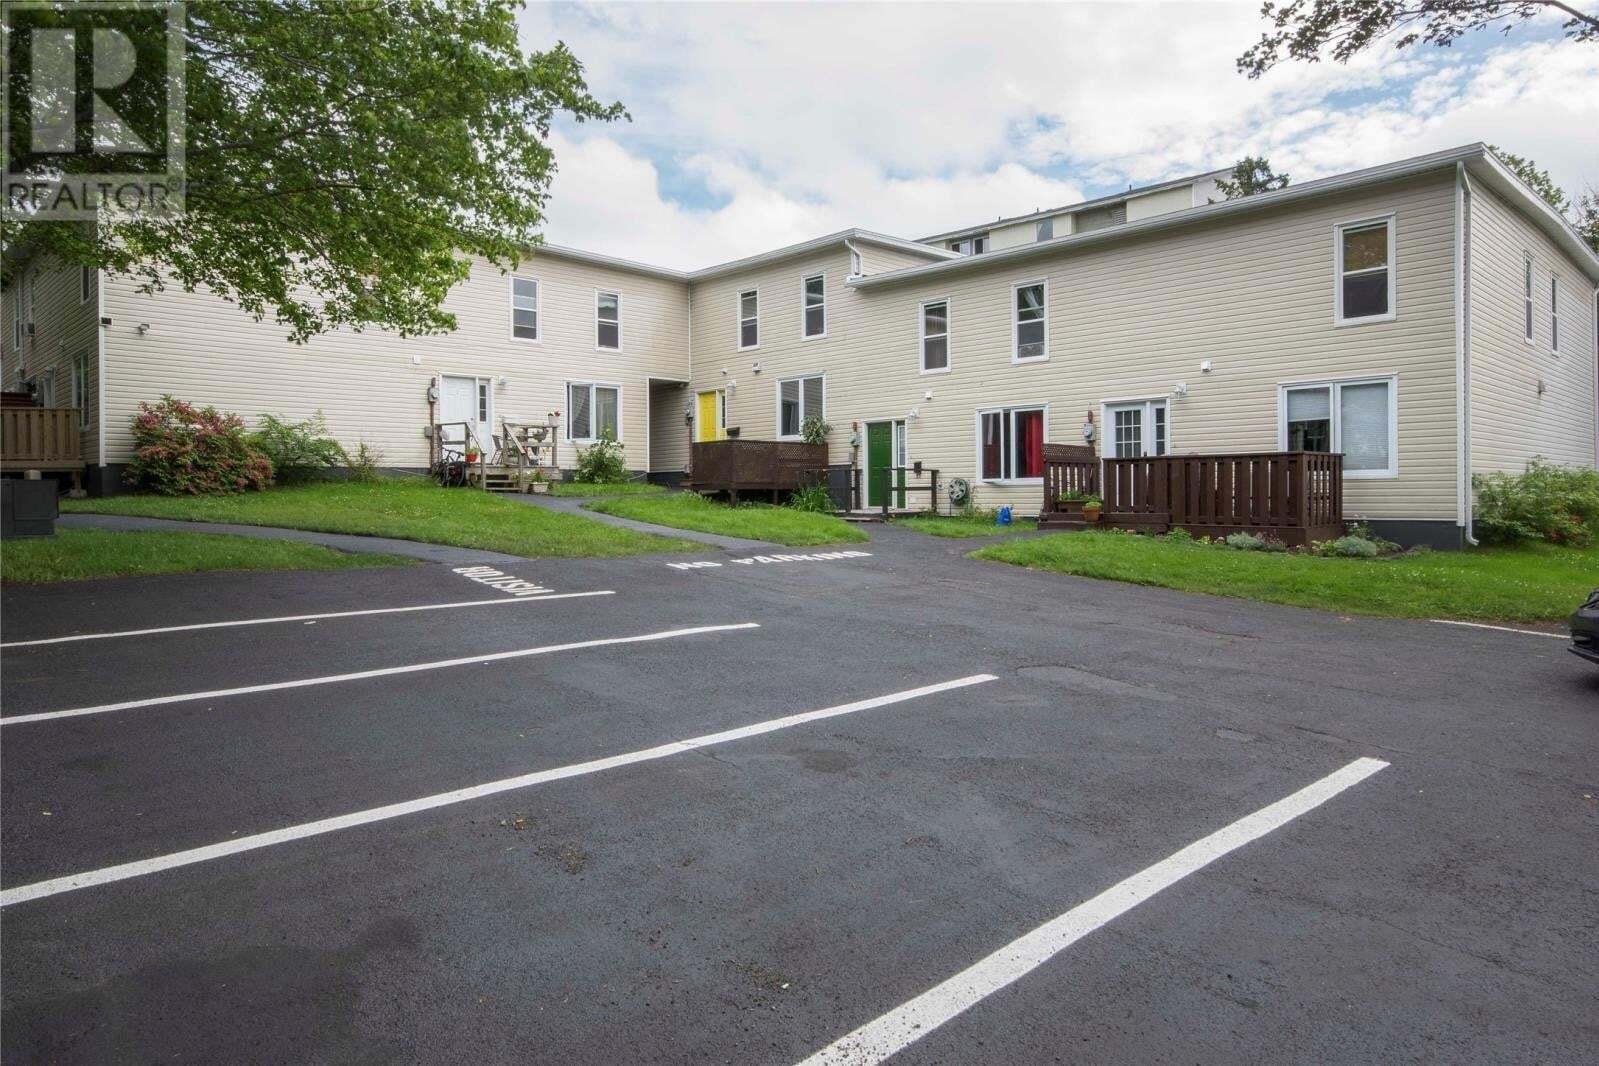 House for sale at 101 Bay Bulls Rd St. John's Newfoundland - MLS: 1220824